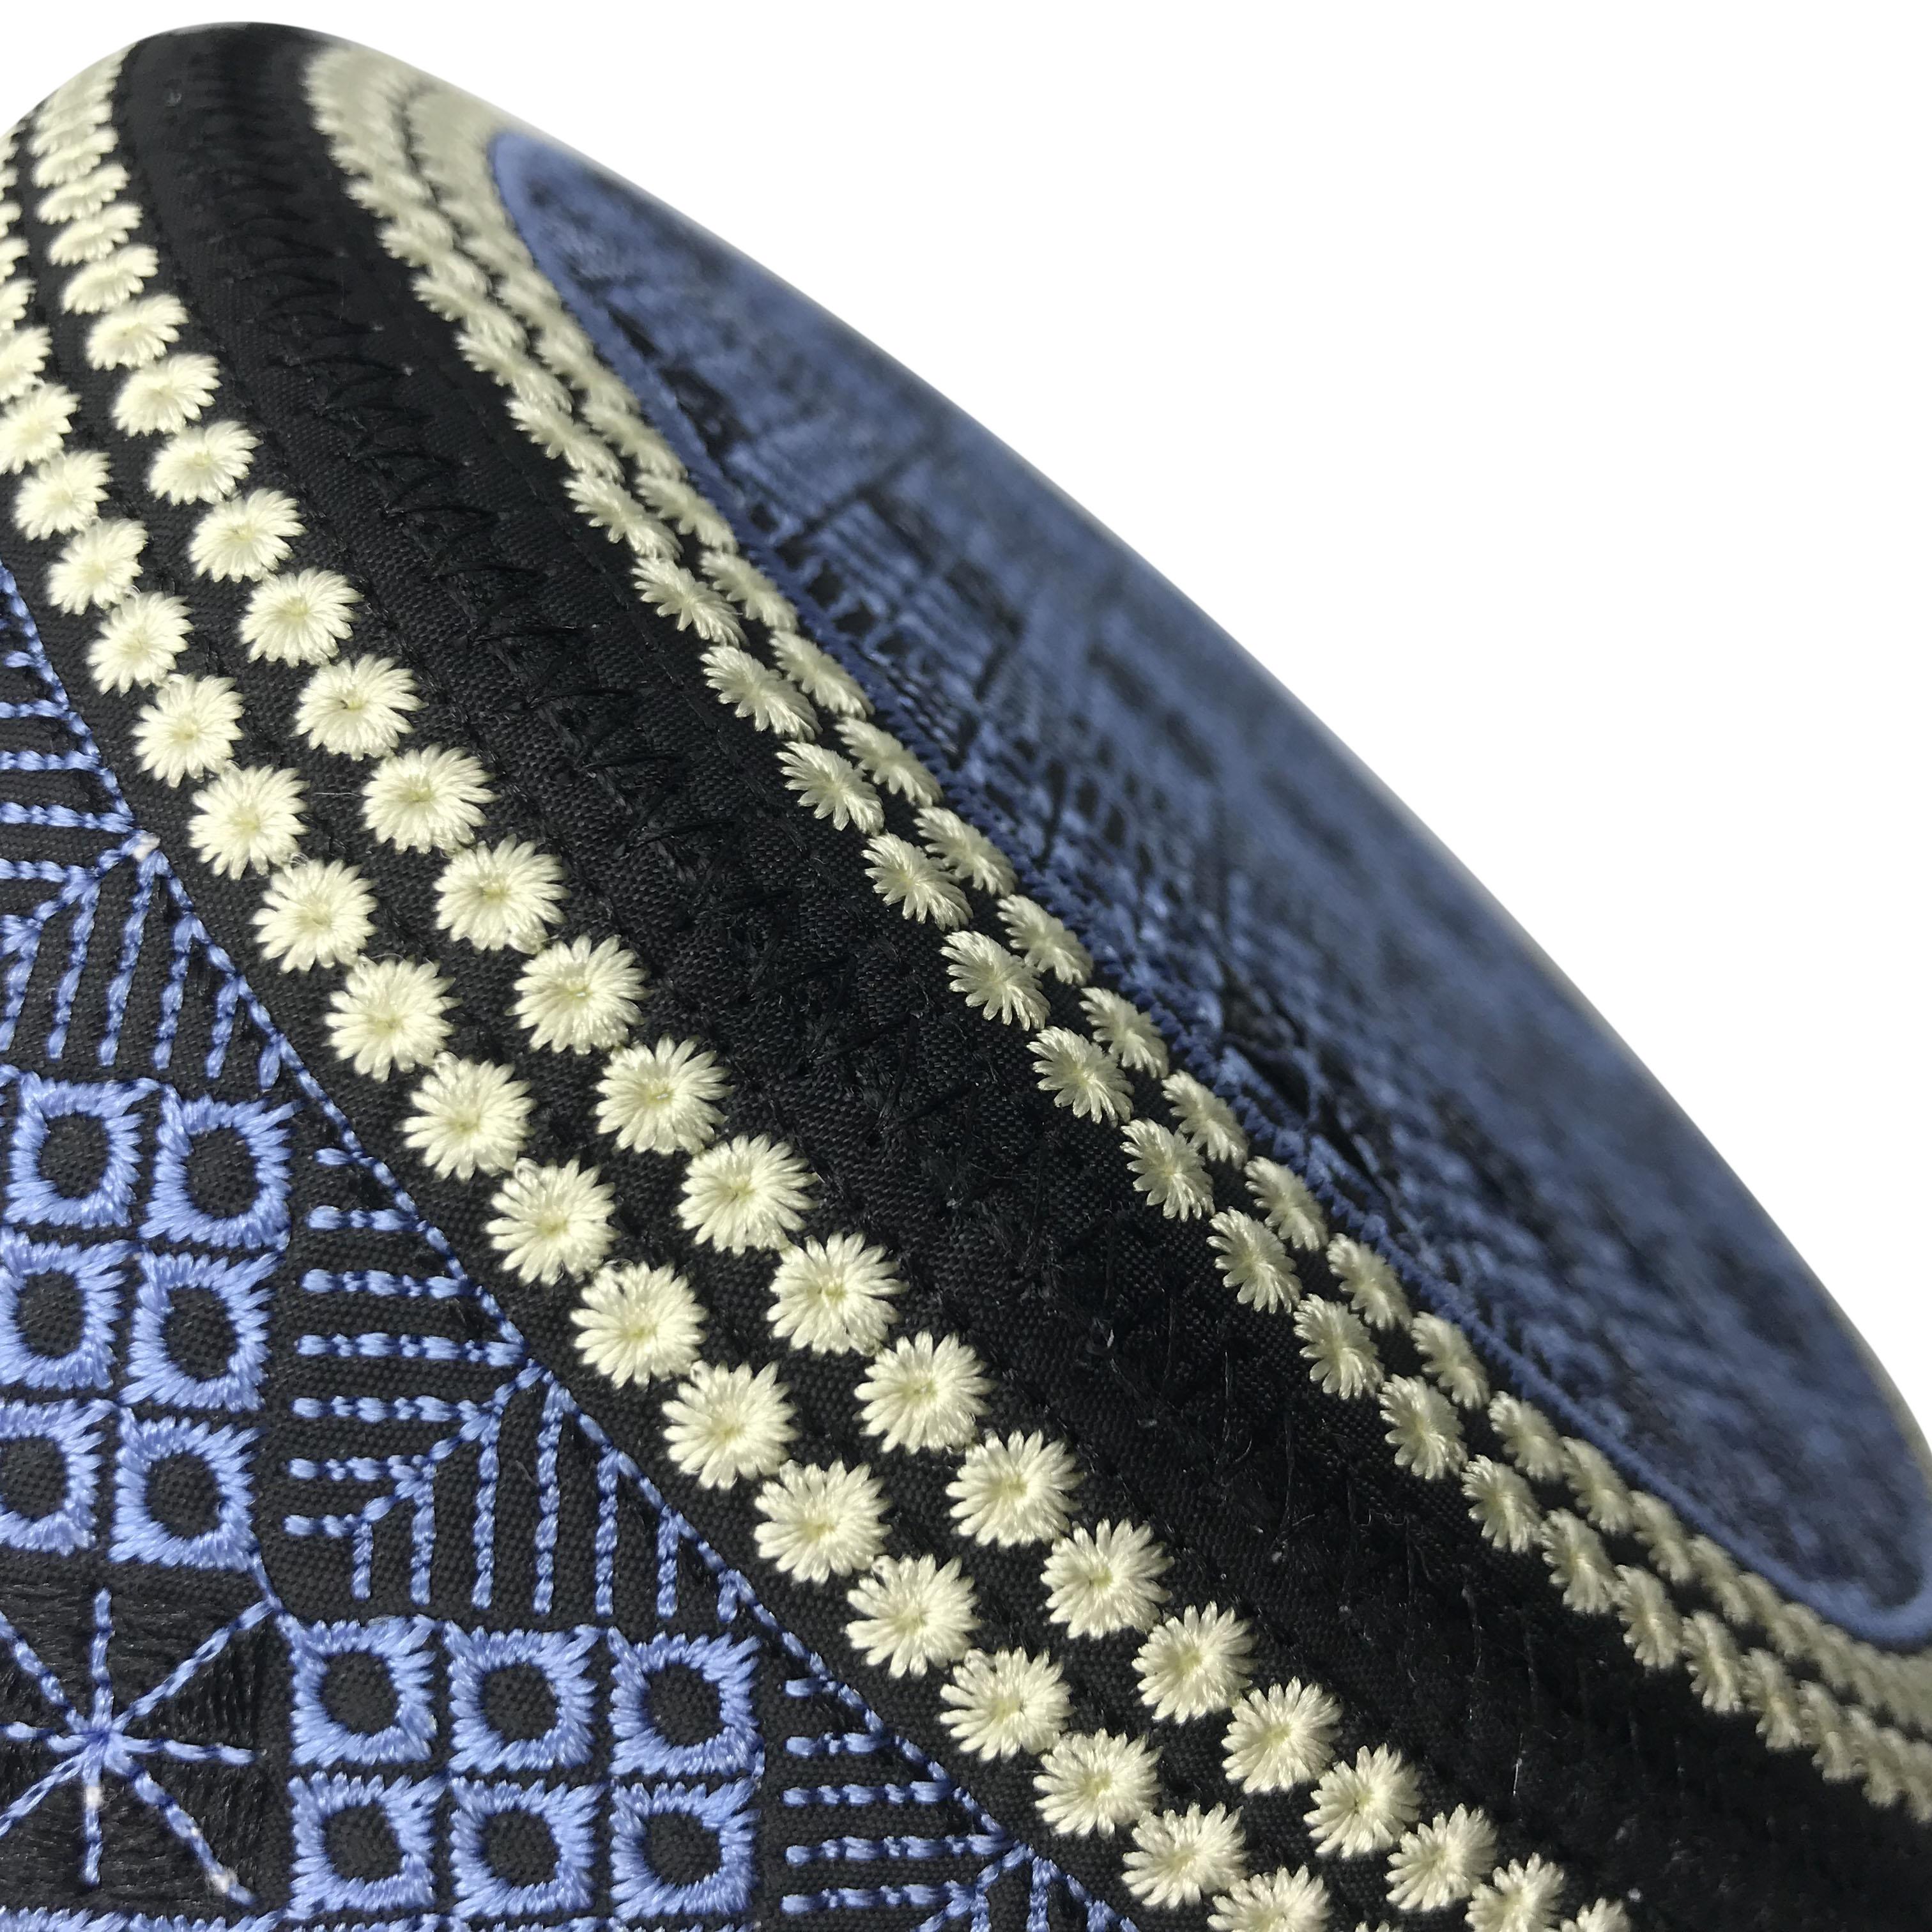 Image 5 - 2020 New Muslim Men Prayer Hats Cotton Embroidery Leisure Saudi  Arabia Islamic Hat Men Headscarf Clothing Topkippot TurbanIslamic  Clothing